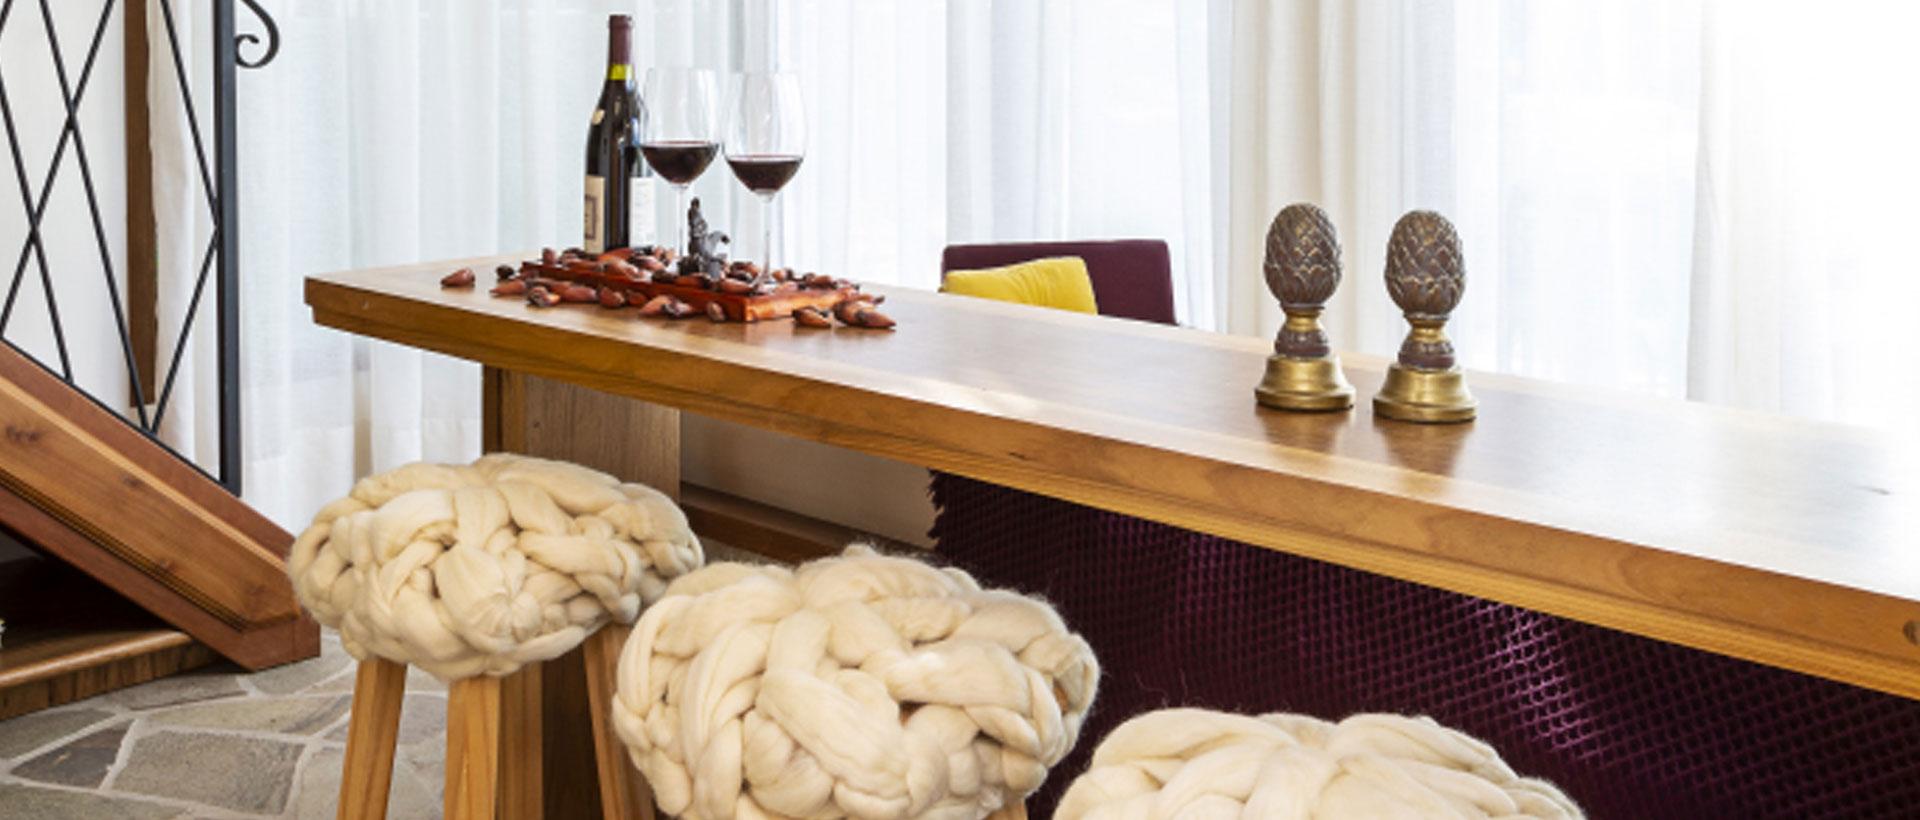 bangalow-hotel-boutique-quebra-noz-conforto-e-natureza3